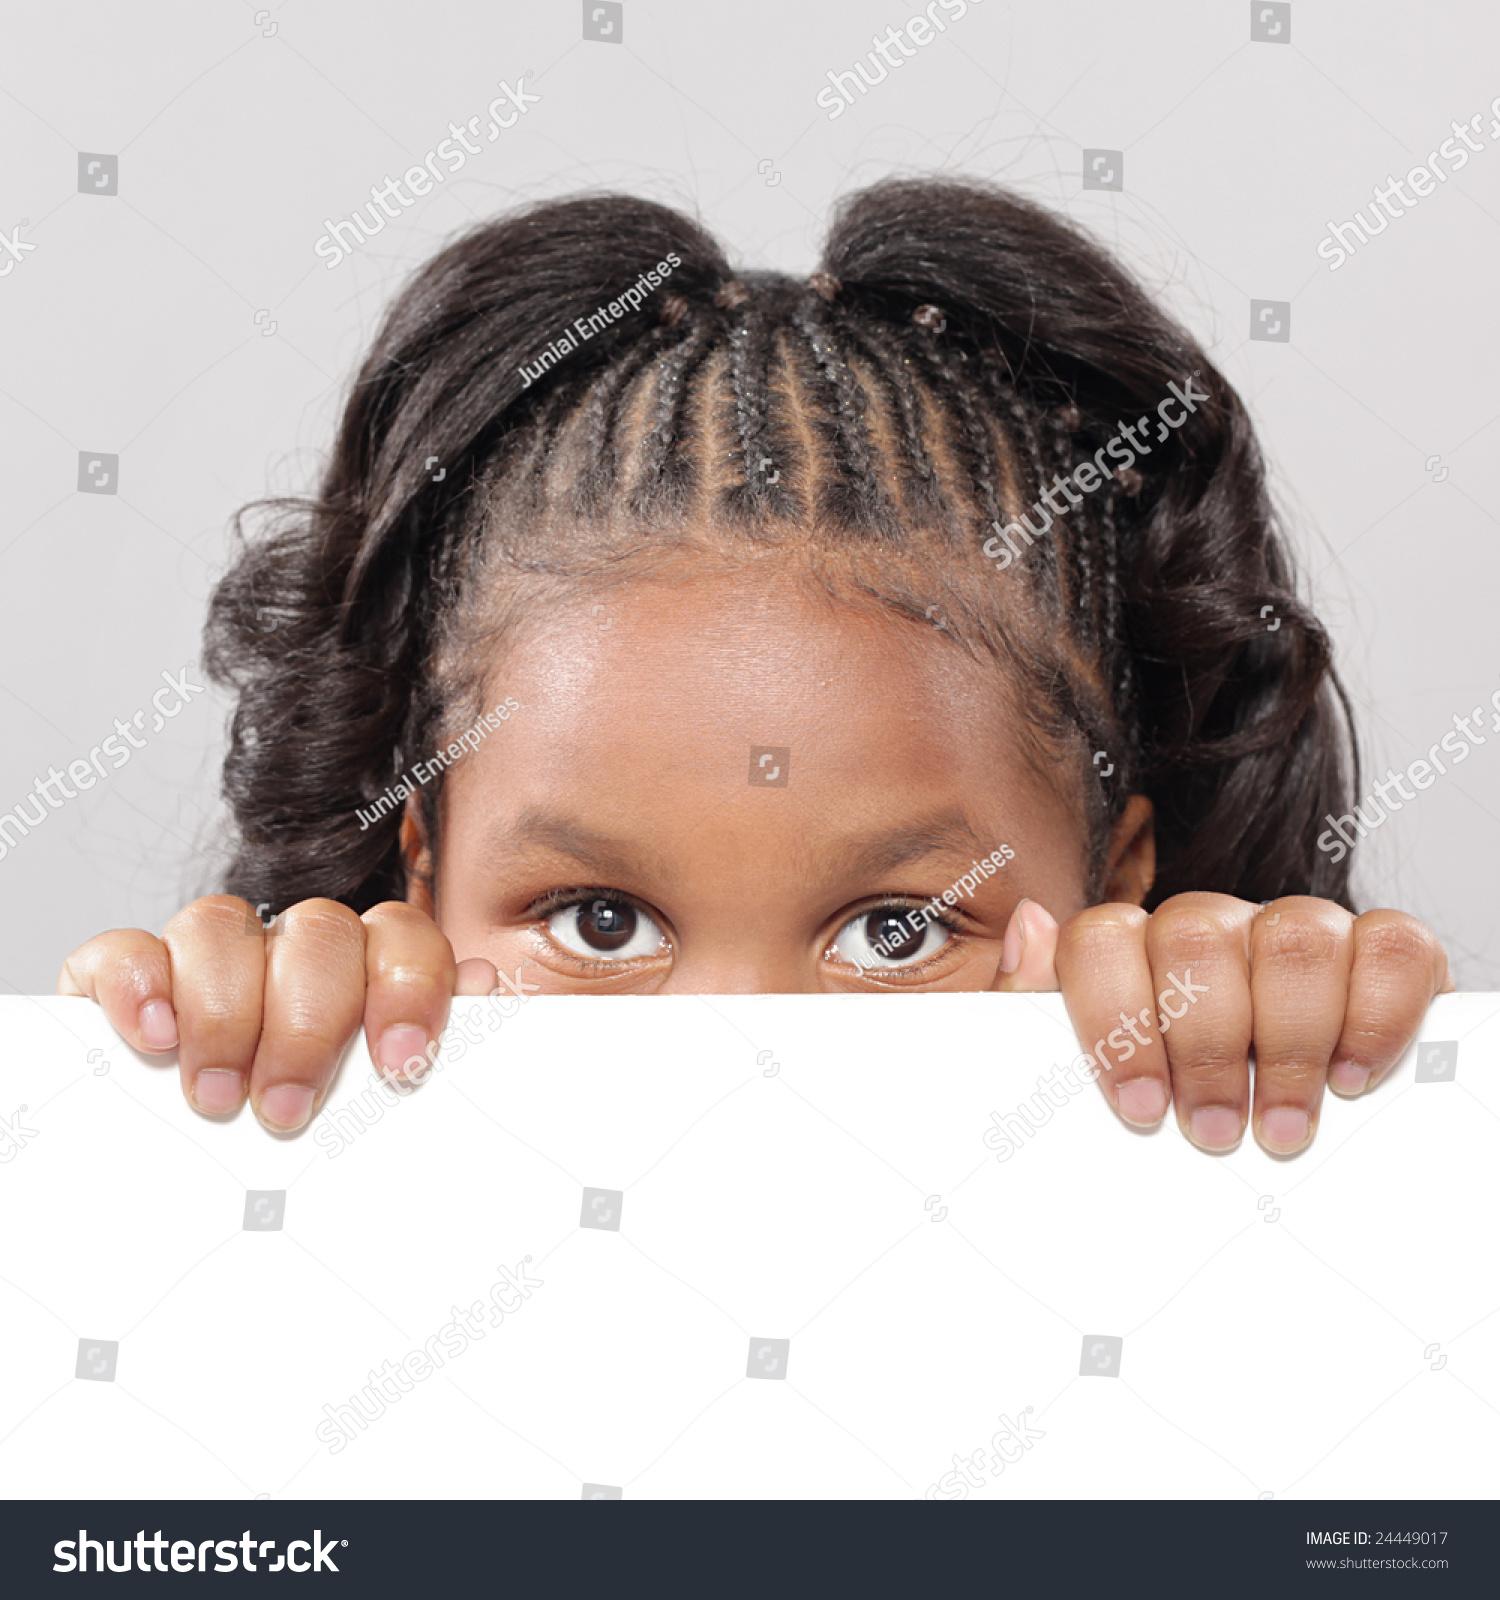 Little Girl Peeking Behind Copy Space Stock Photo 24449017